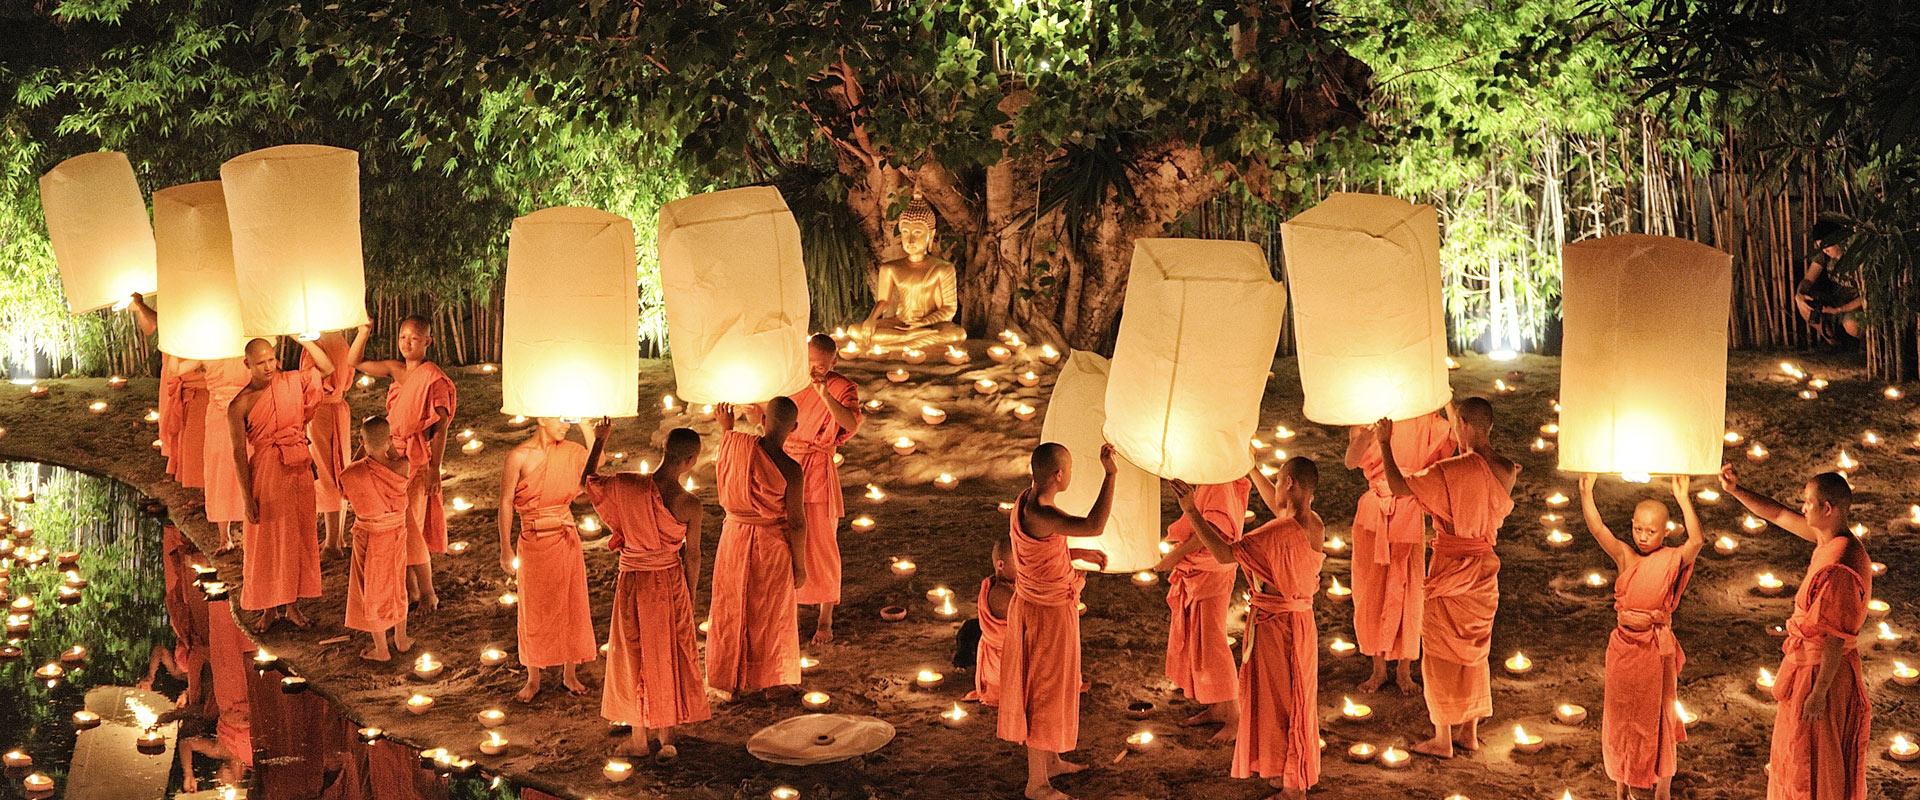 Fête Yi Peng Chiang Mai Thaïlande Amedasie